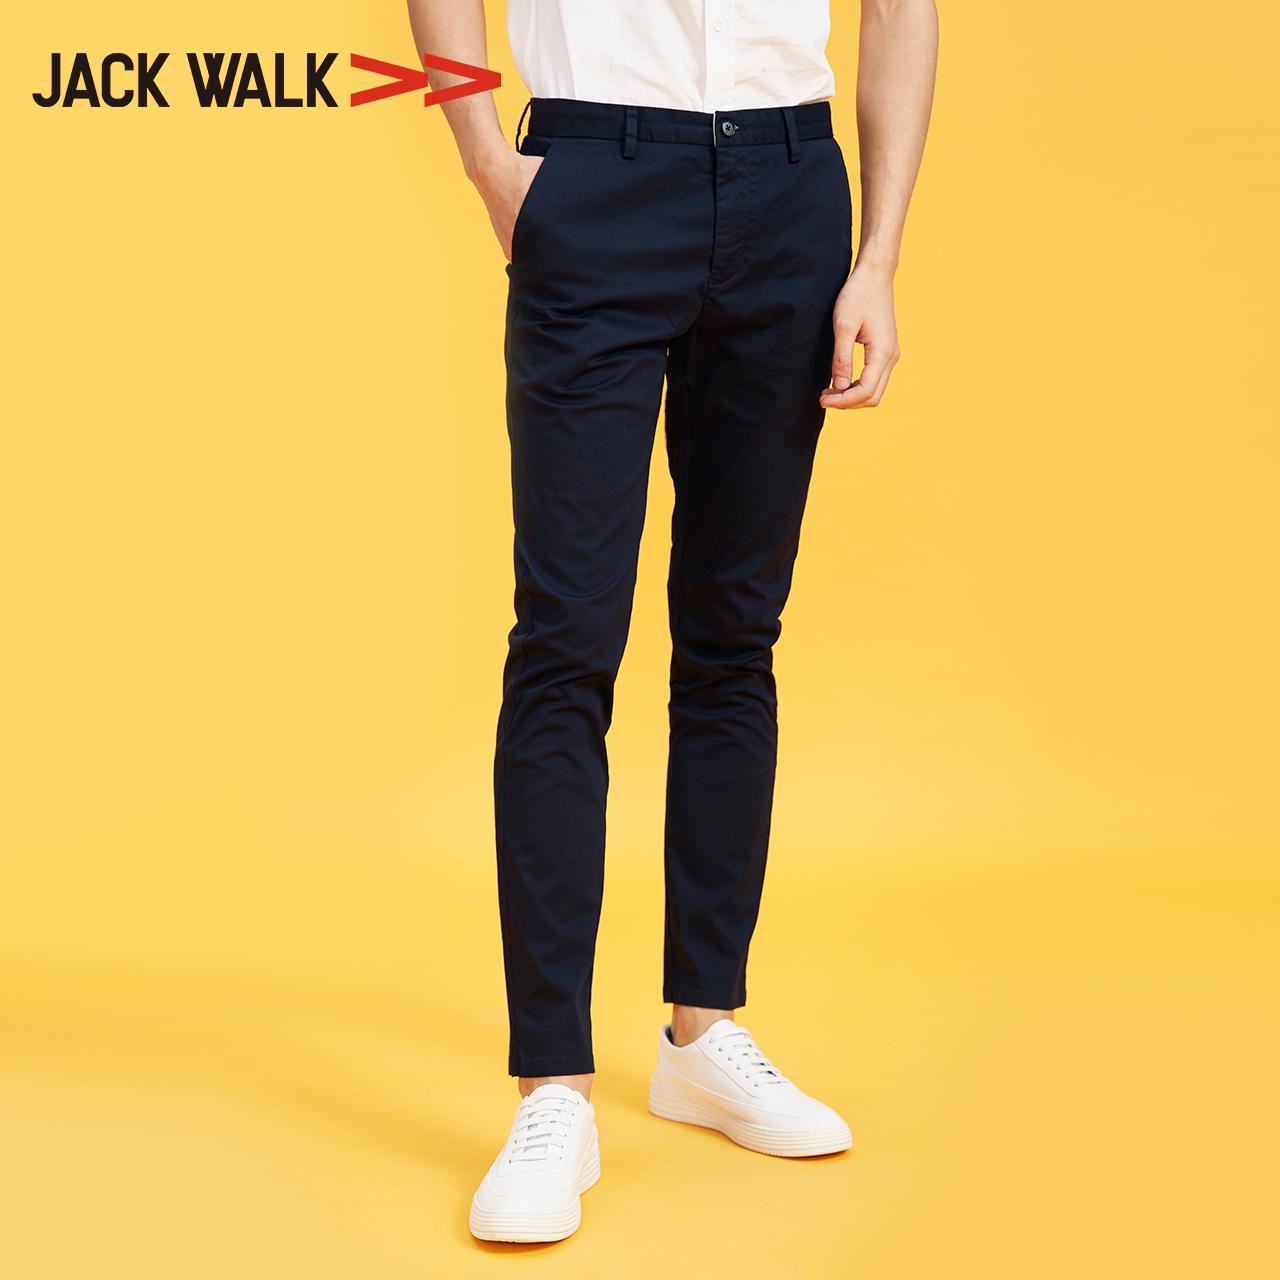 Jackwalk拉夏贝尔男装纯色休闲长裤 2018夏季新品直筒修身裤子男